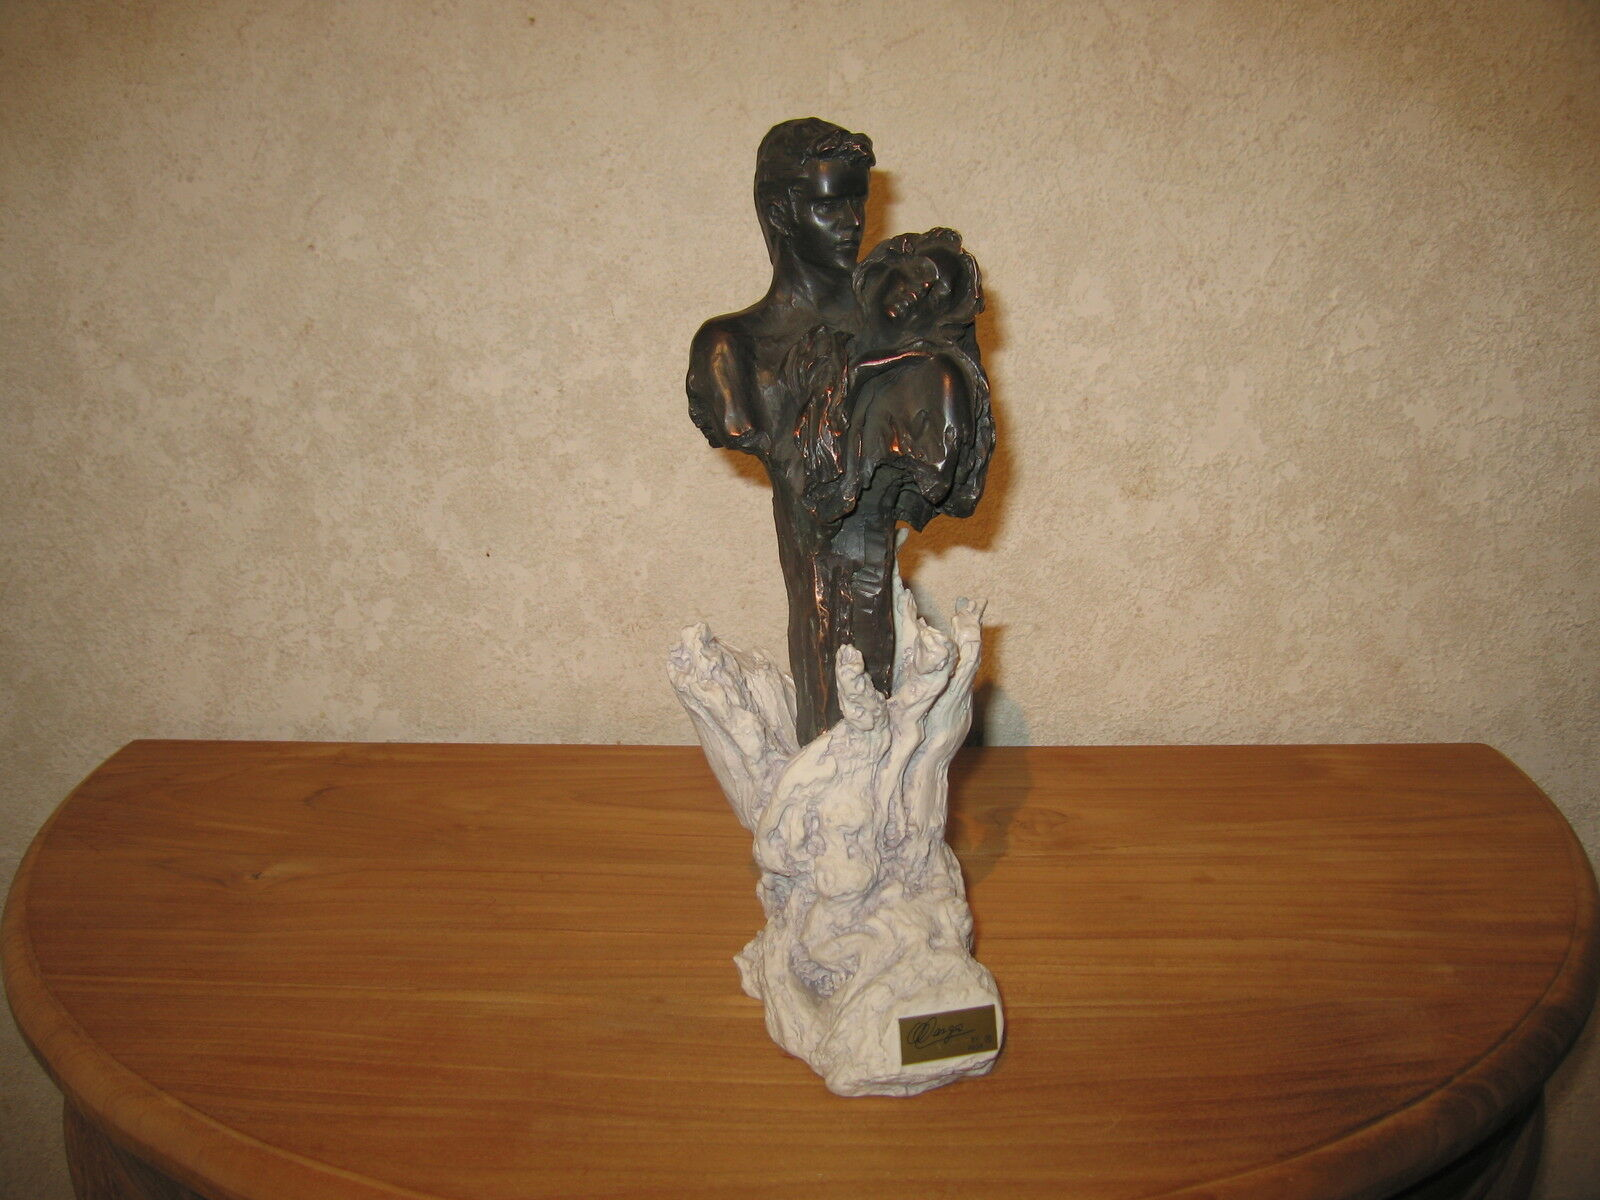 PAOR NEW Posture Figurine couple amoureux H.31cm